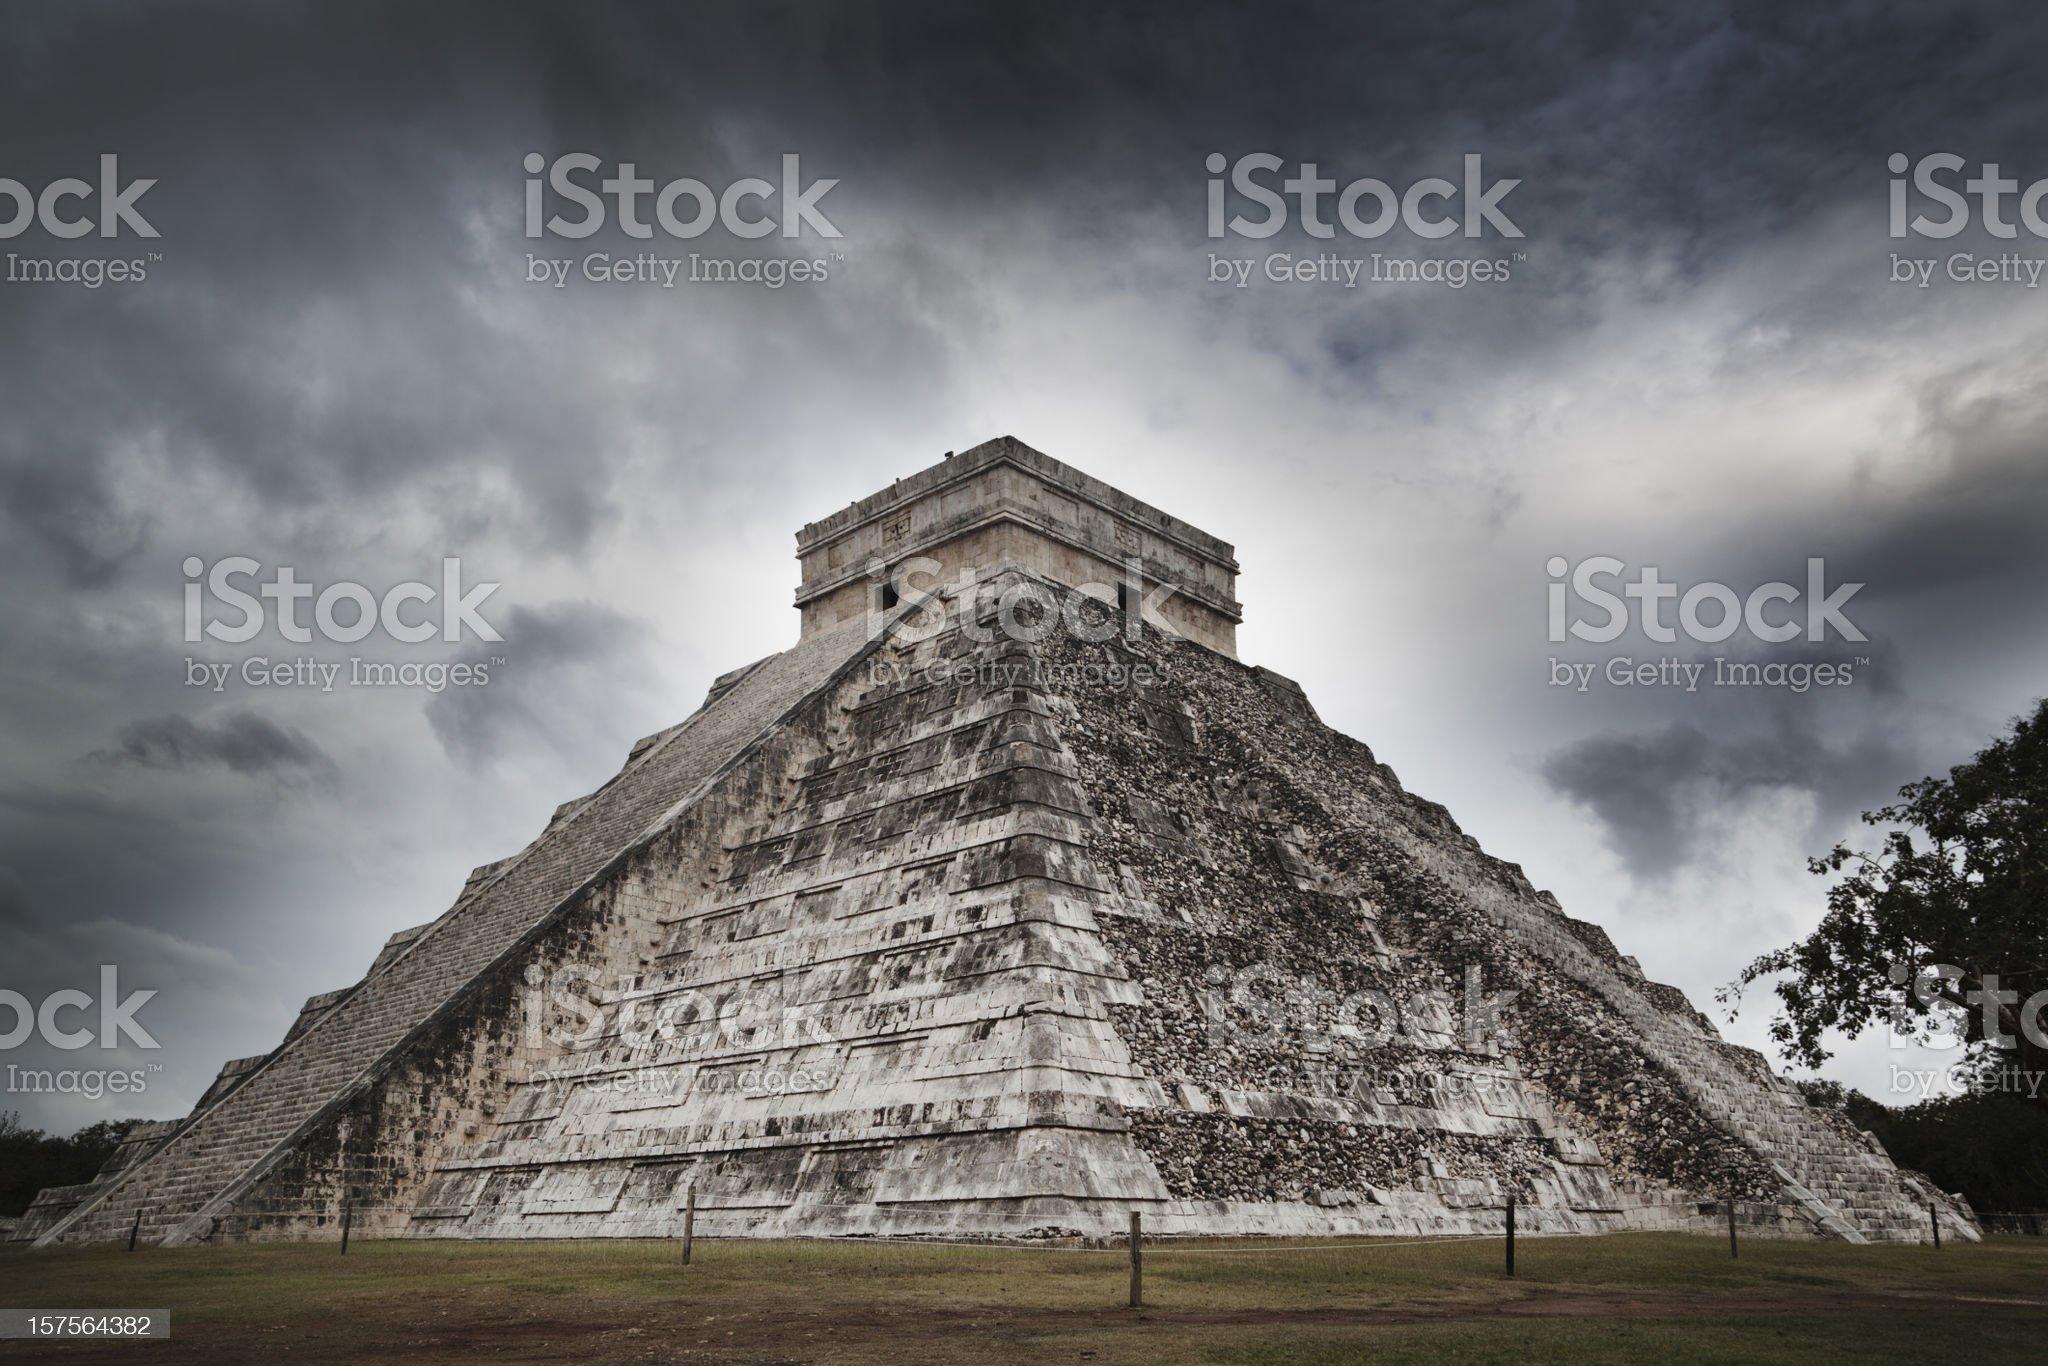 Mayan Chichen Itza Ancient Pyramid Temple Ruin of Yucatan Mexico royalty-free stock photo